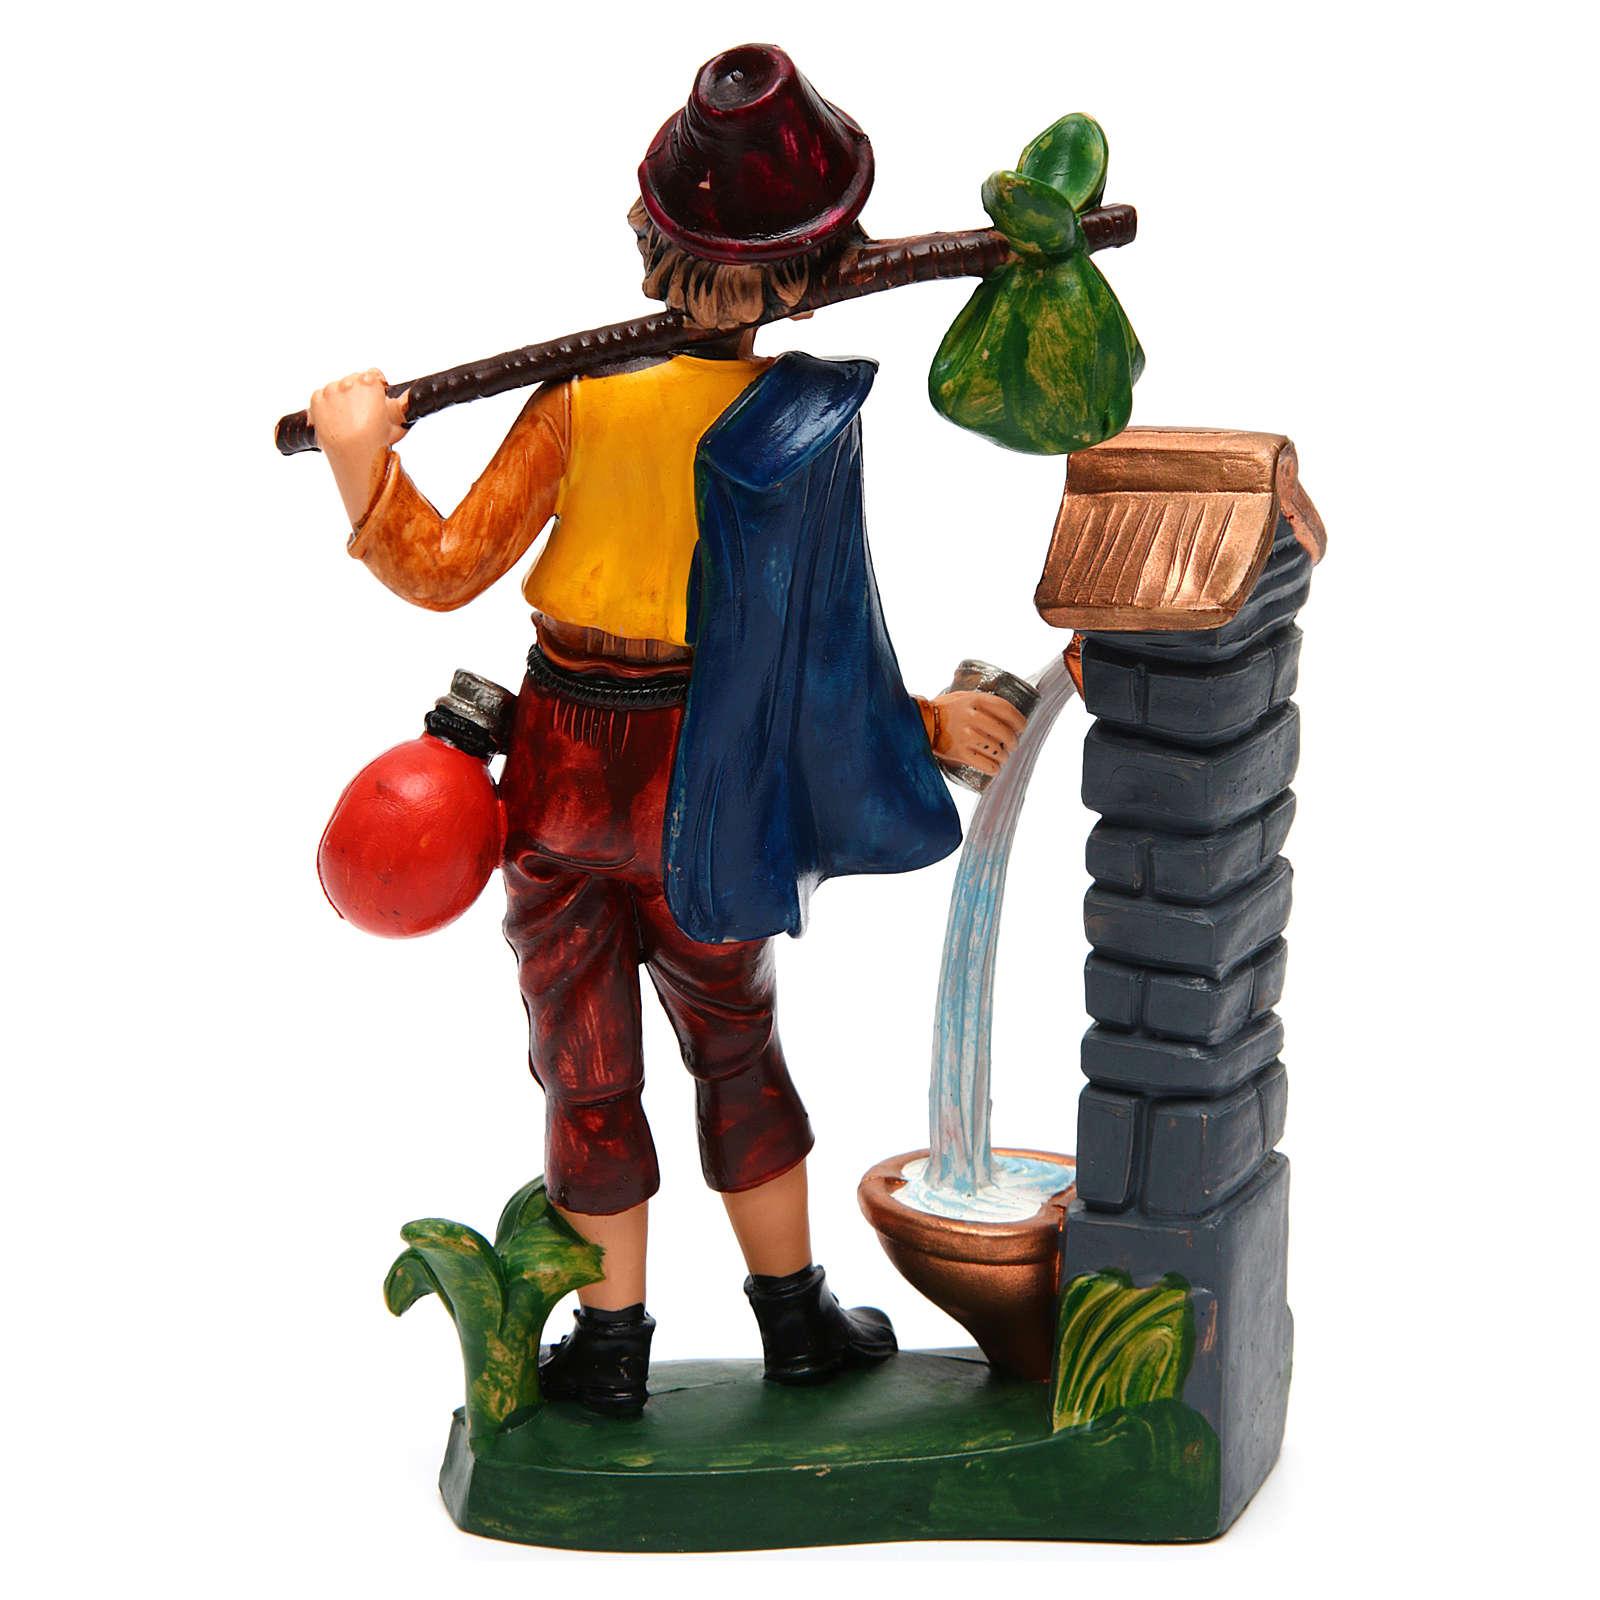 Uomo alla fontana 16 cm presepe 3